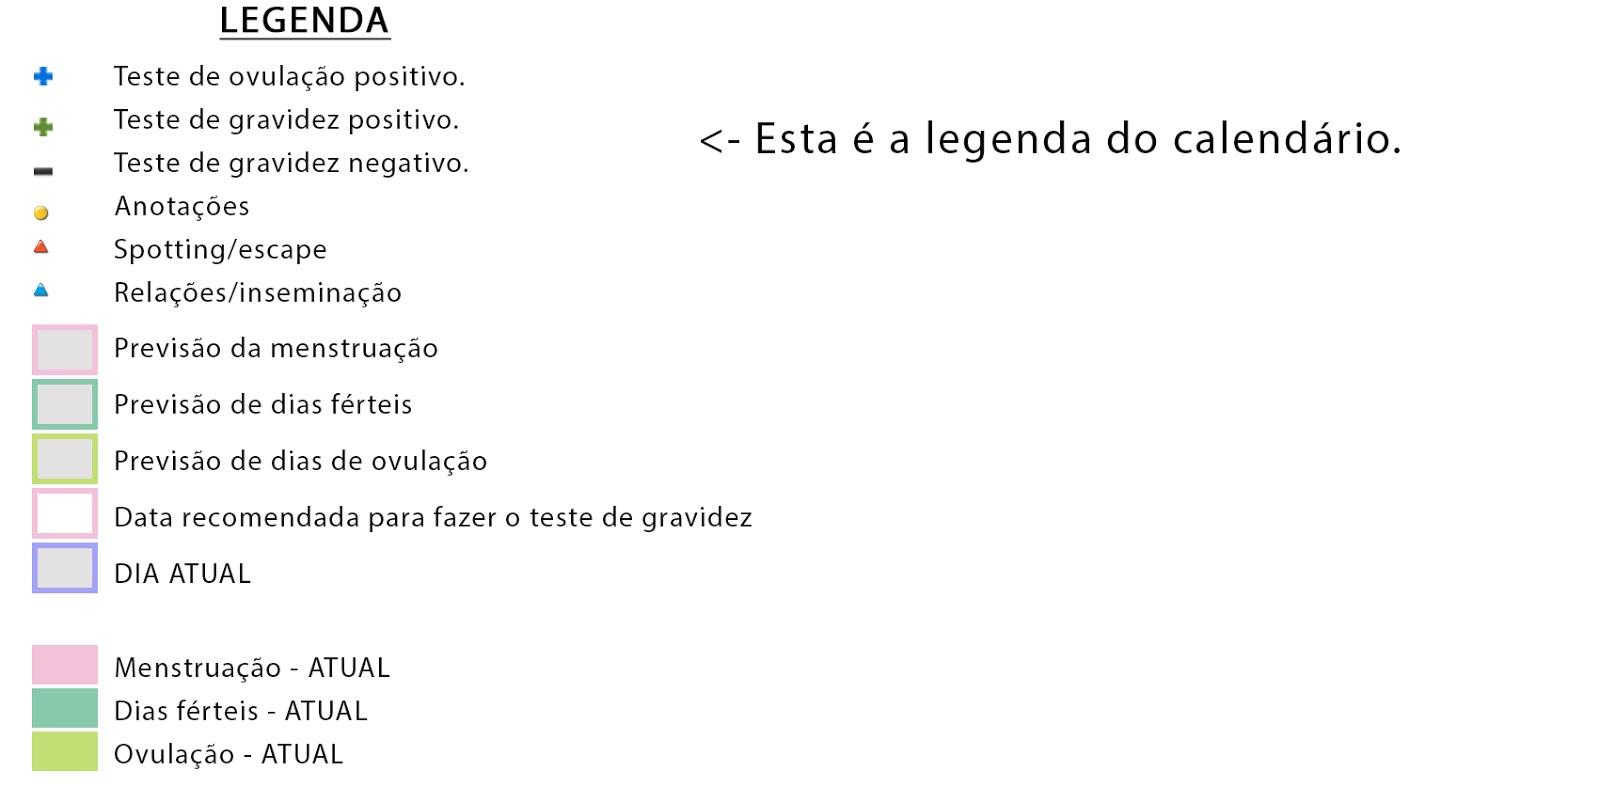 O que significa friends em portugues